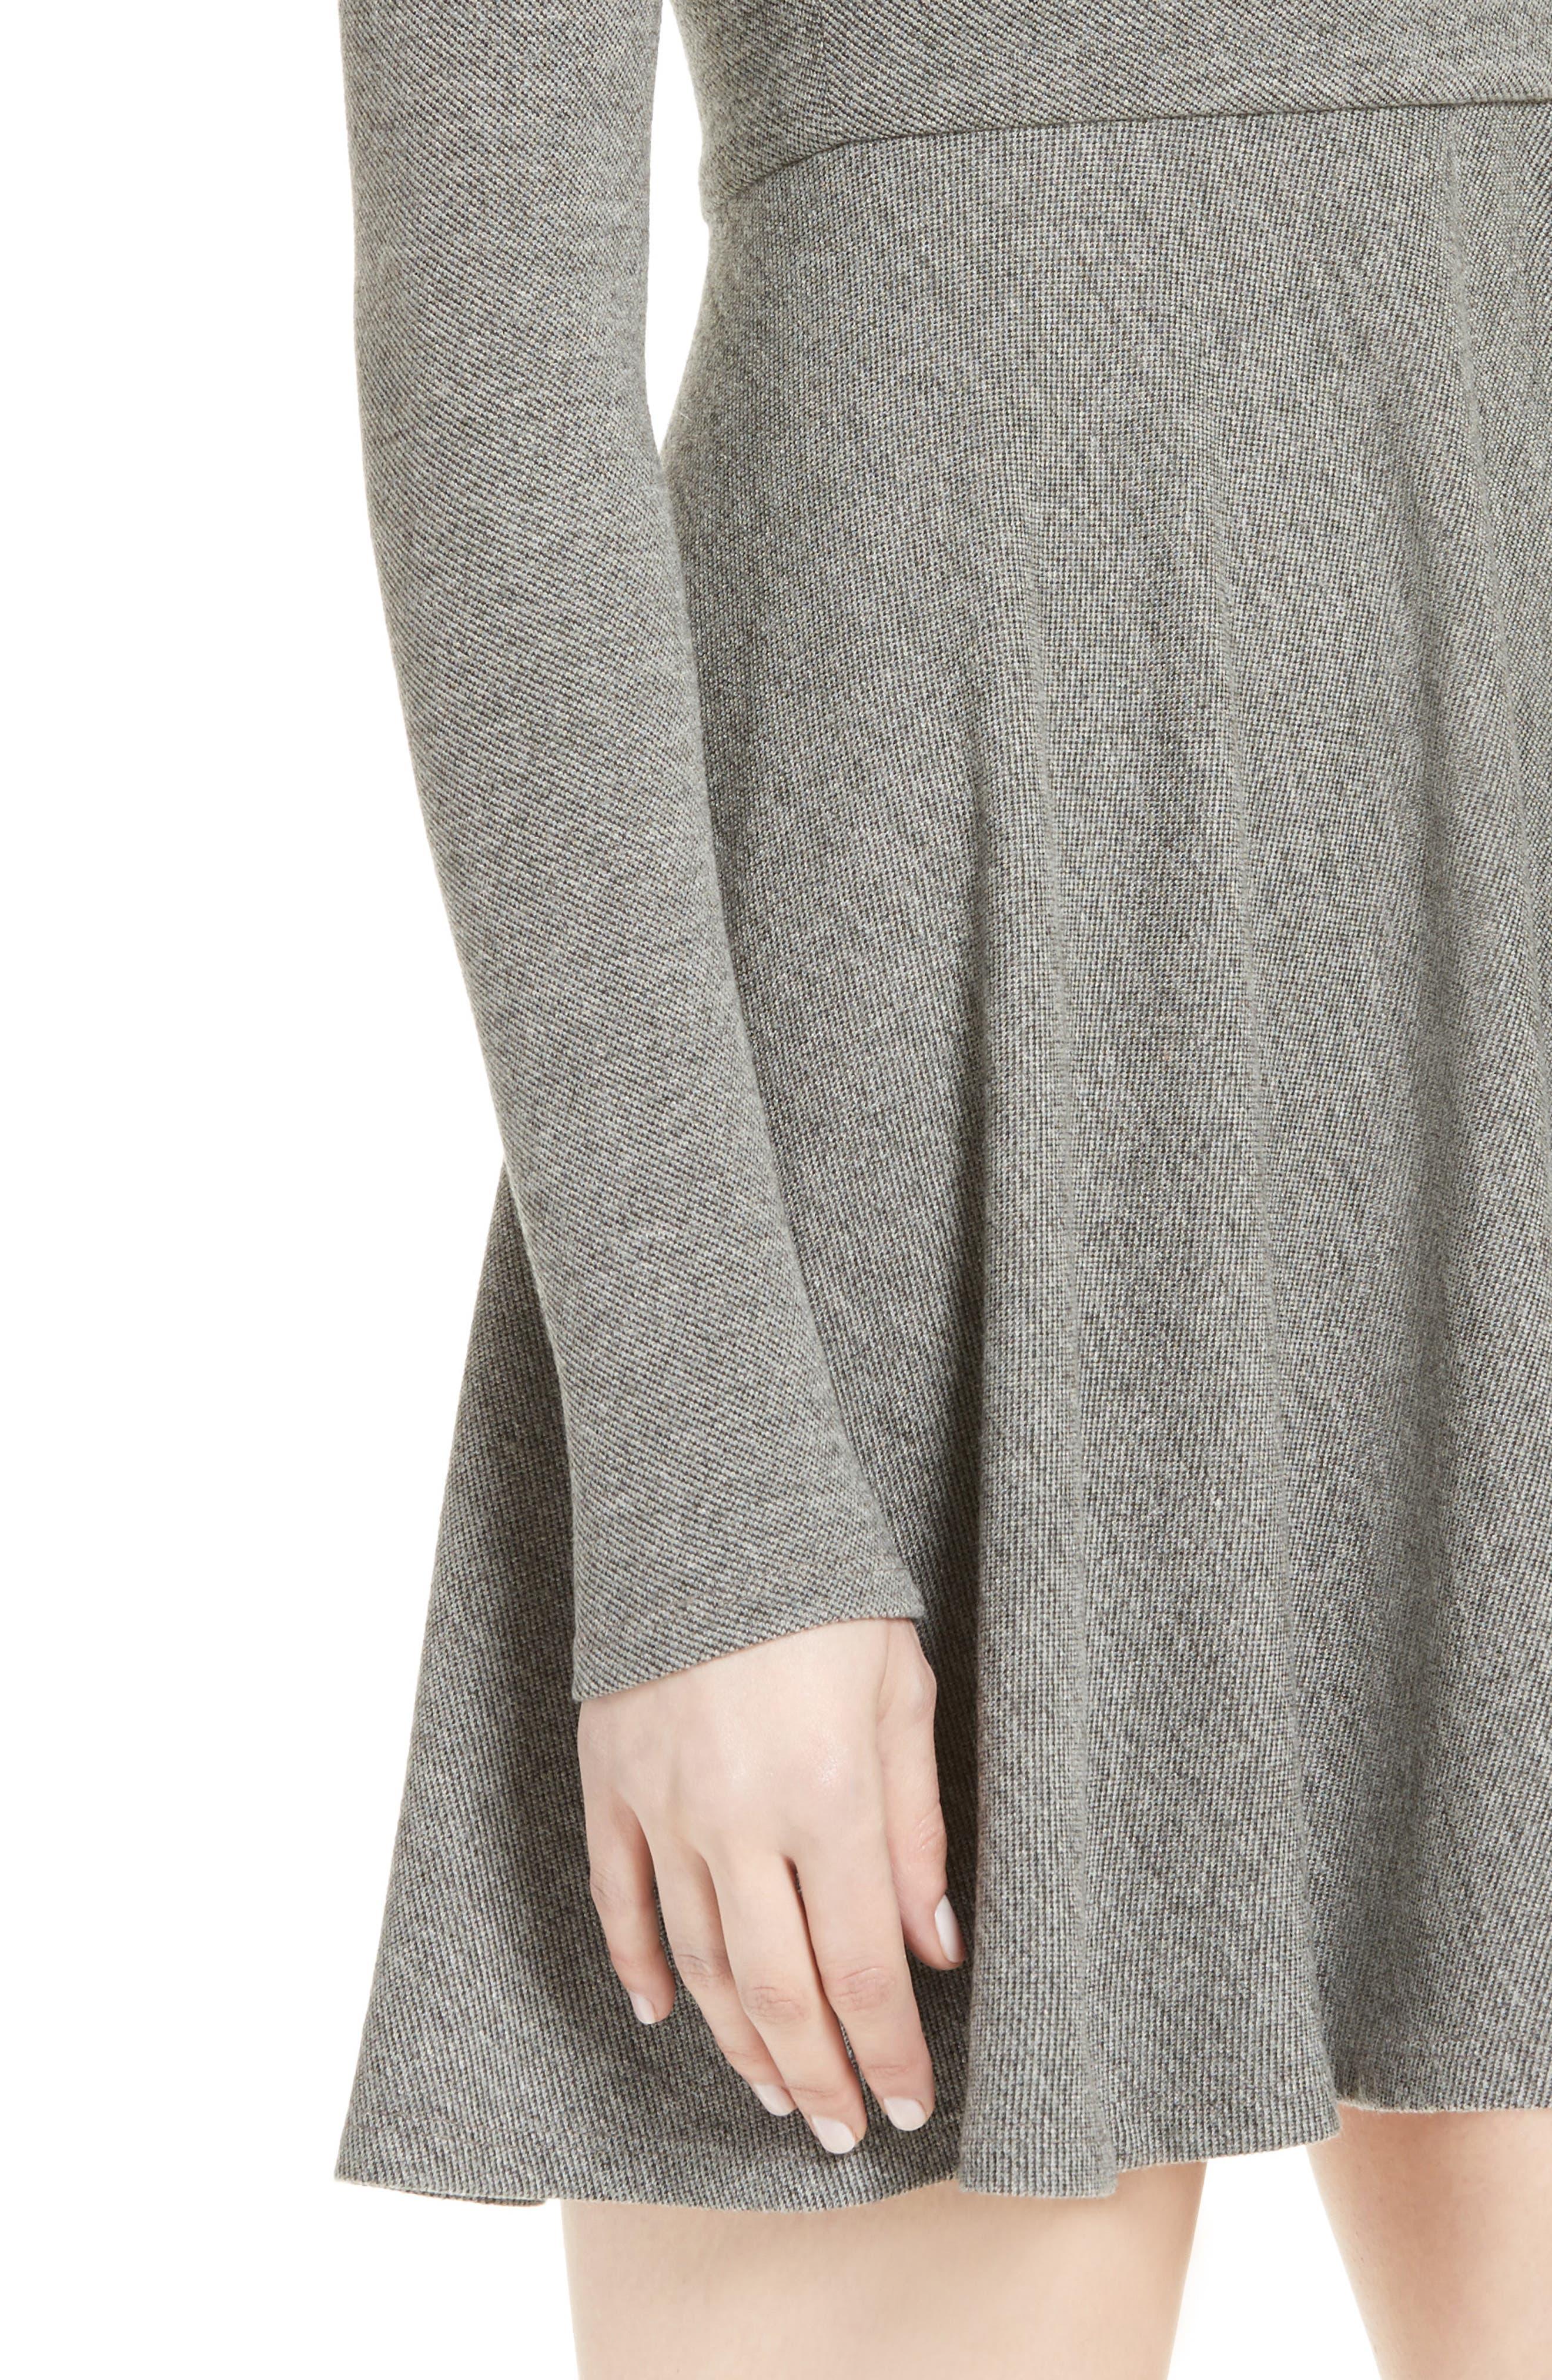 'Brinley' Long Sleeve Mini Dress,                             Alternate thumbnail 4, color,                             GREY